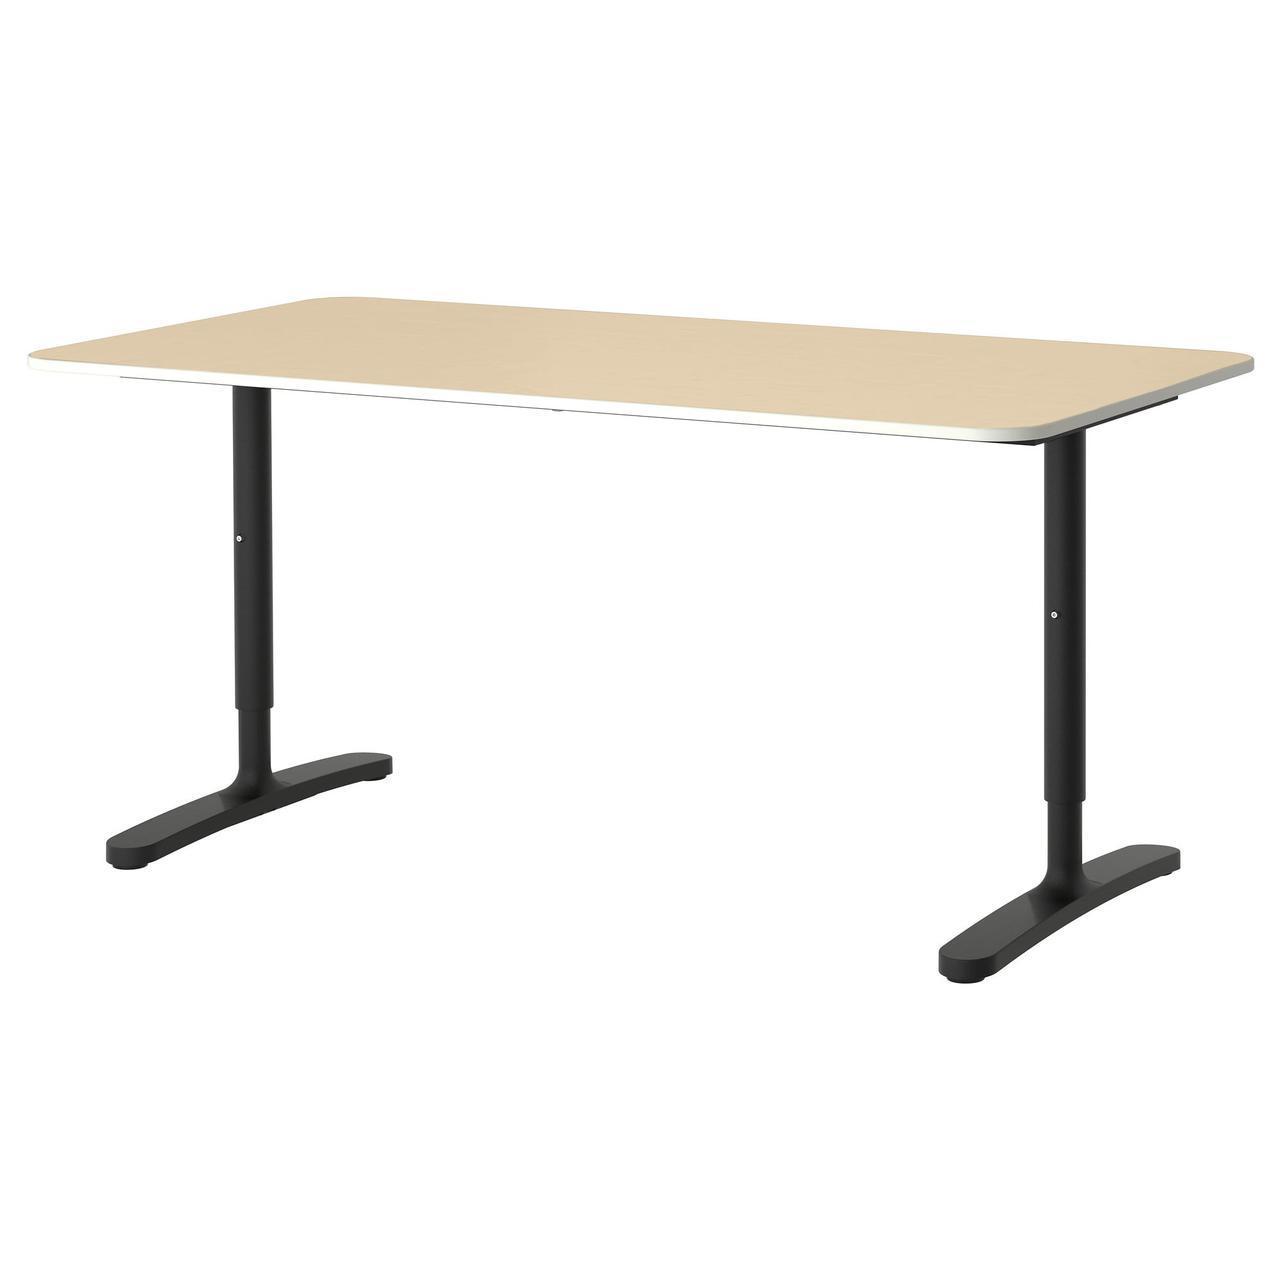 Ikea Bekant 19022790 письменный стол белый цена 6 741 грн